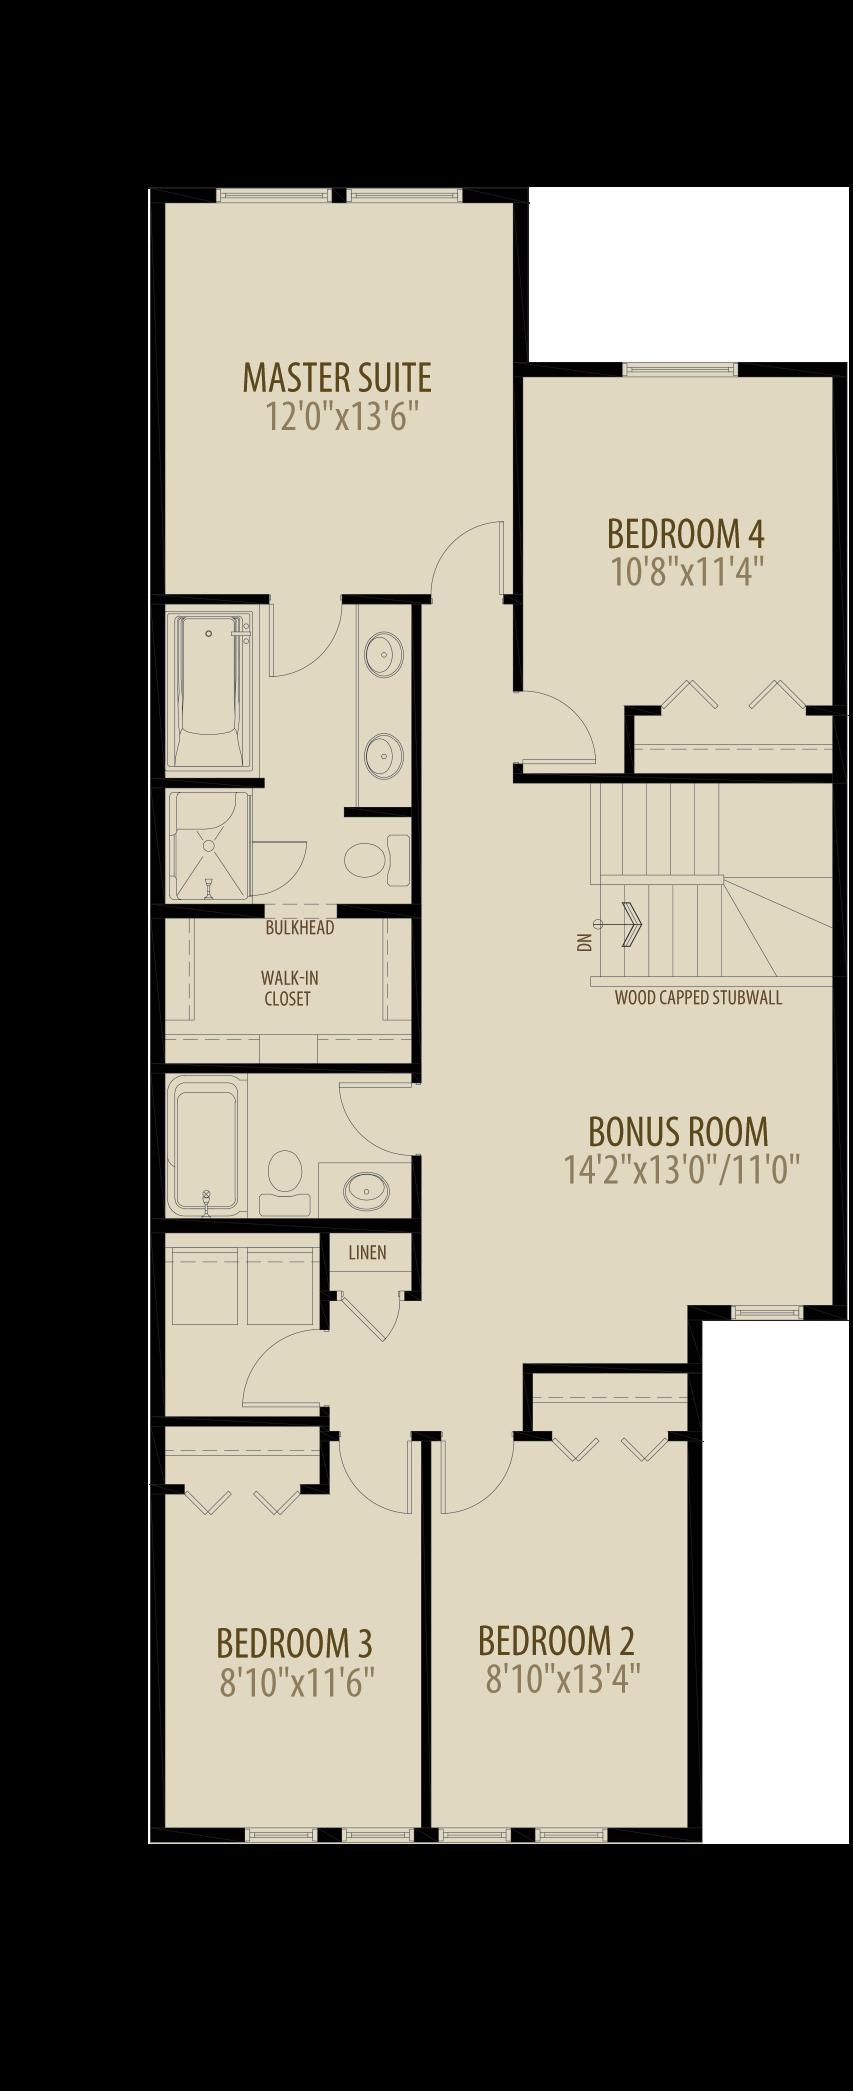 4th Bedroom Bonus Room Adds 105 sq ft